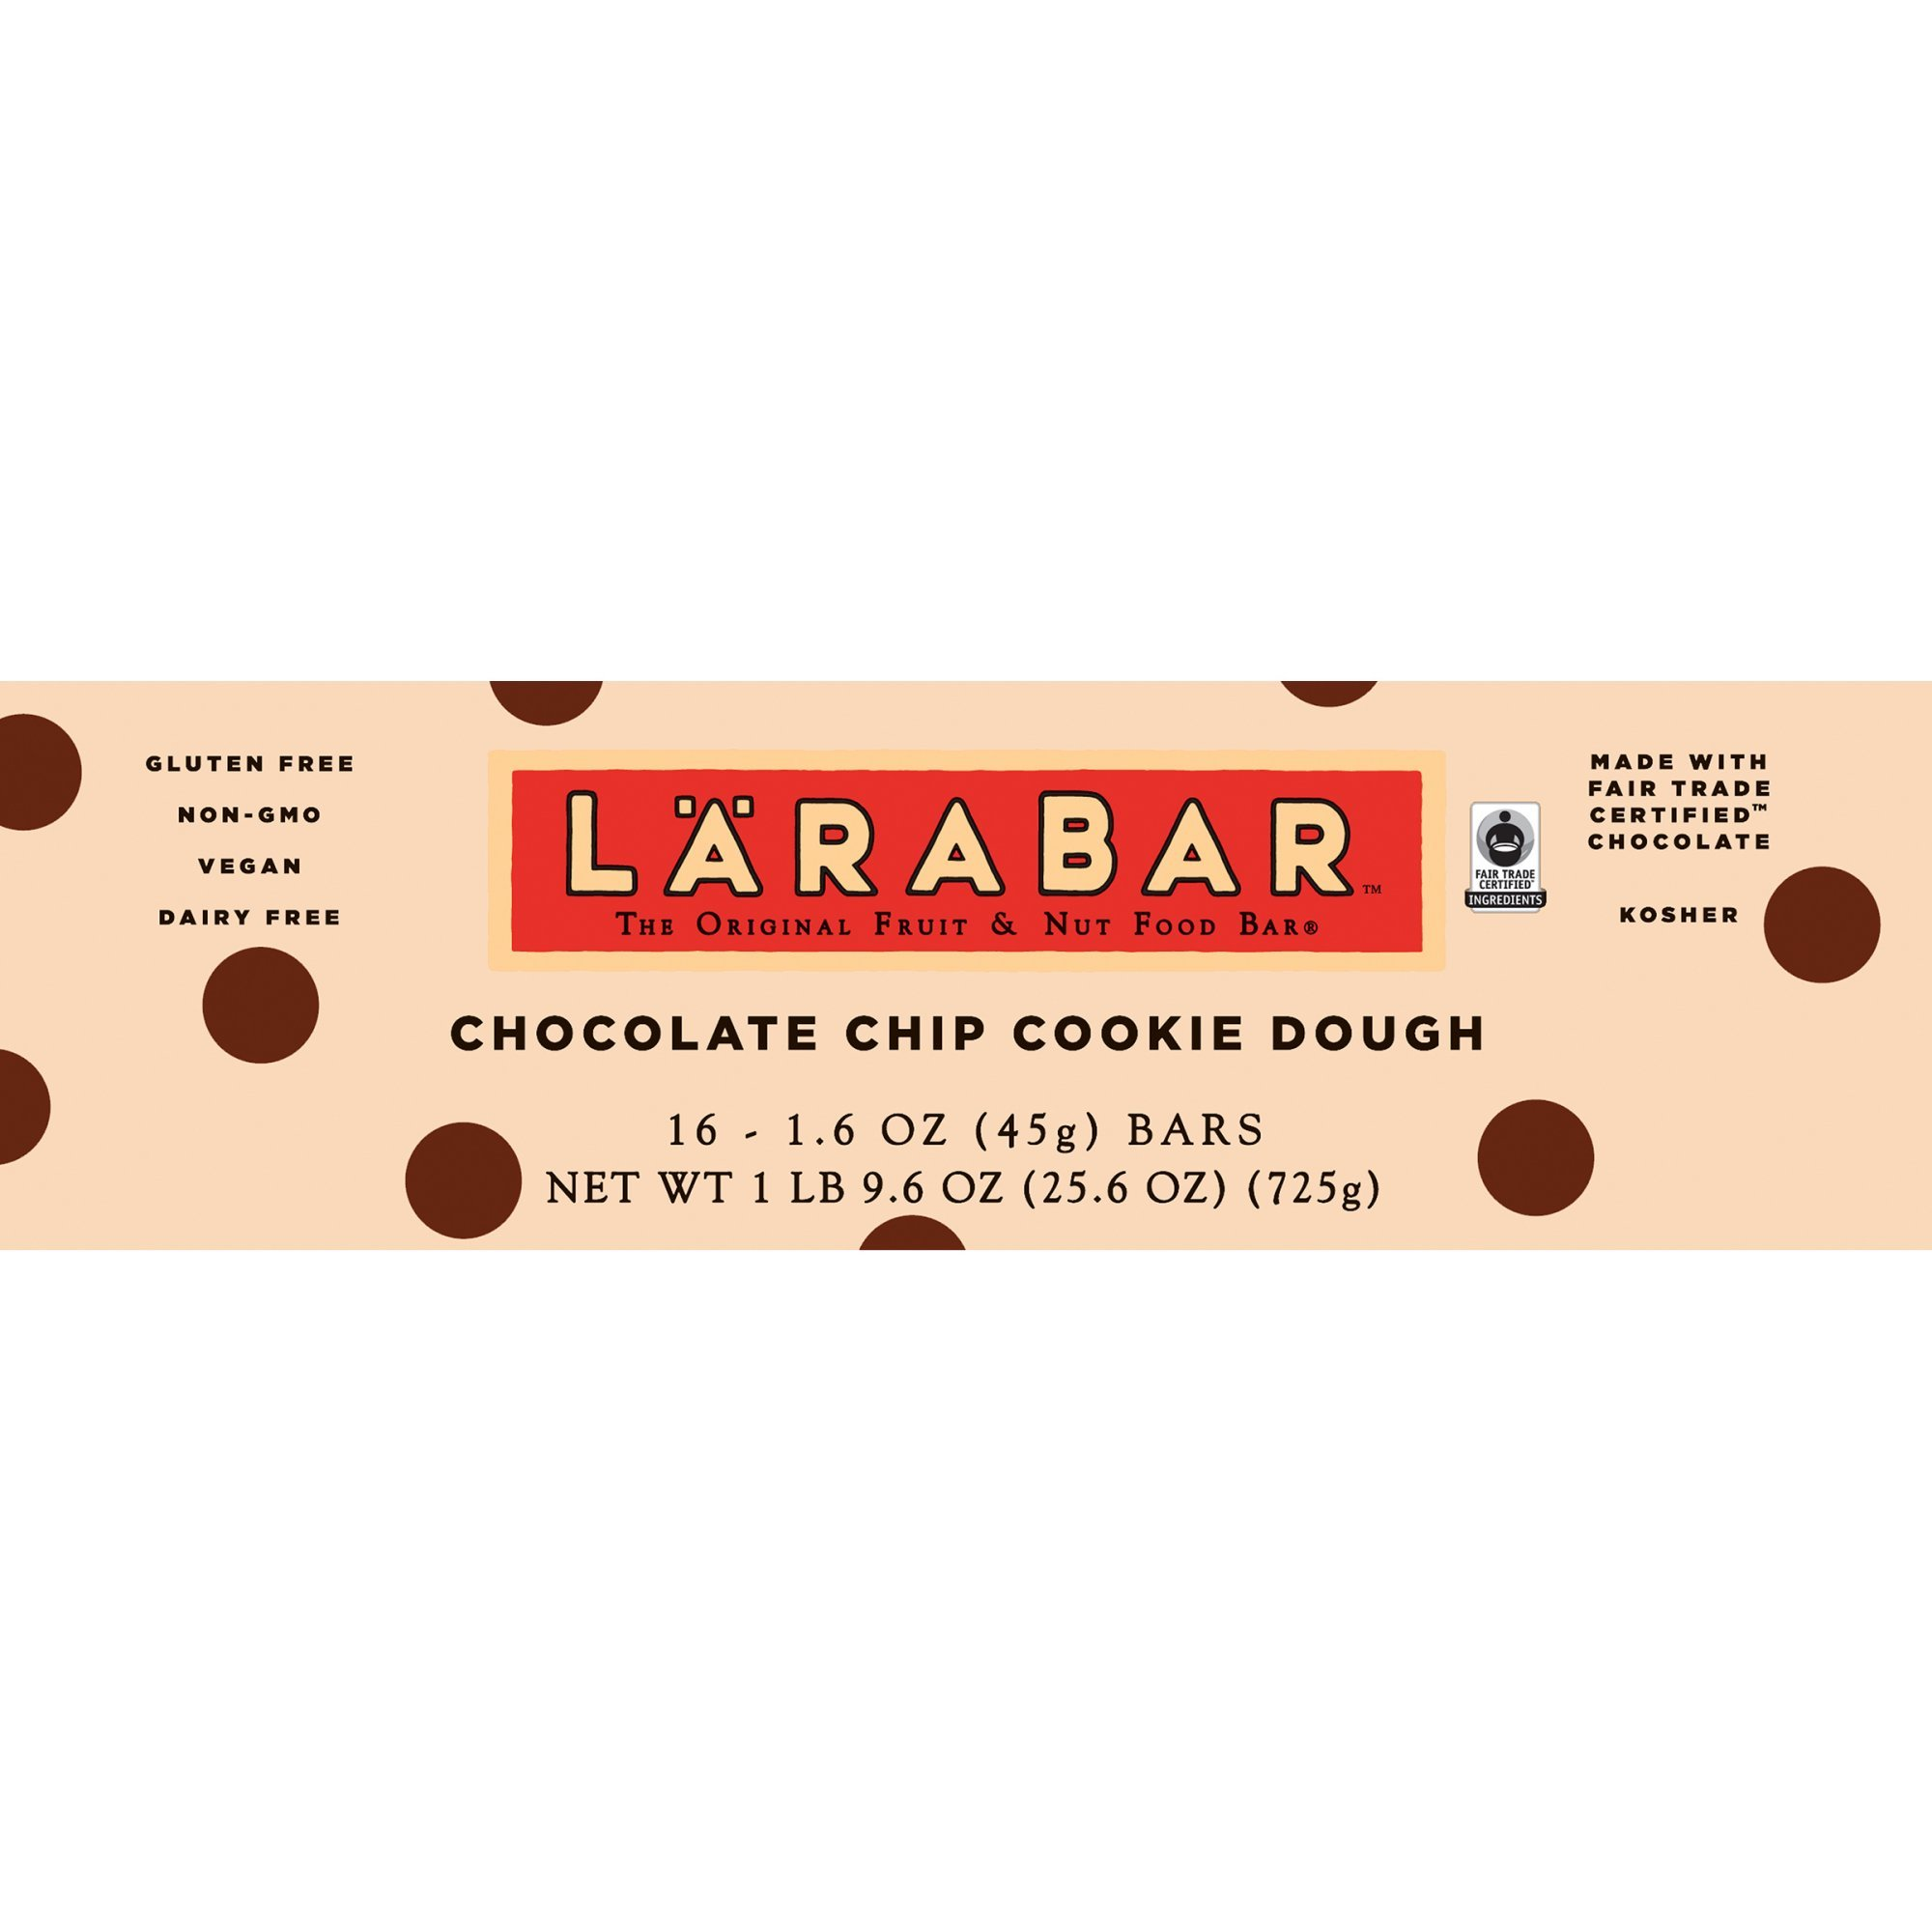 Lärabar Chocolate Chip Cookie Dough Fruit & Nut Bars 16 ct Box (Pack of 5) by Larabar (Image #3)